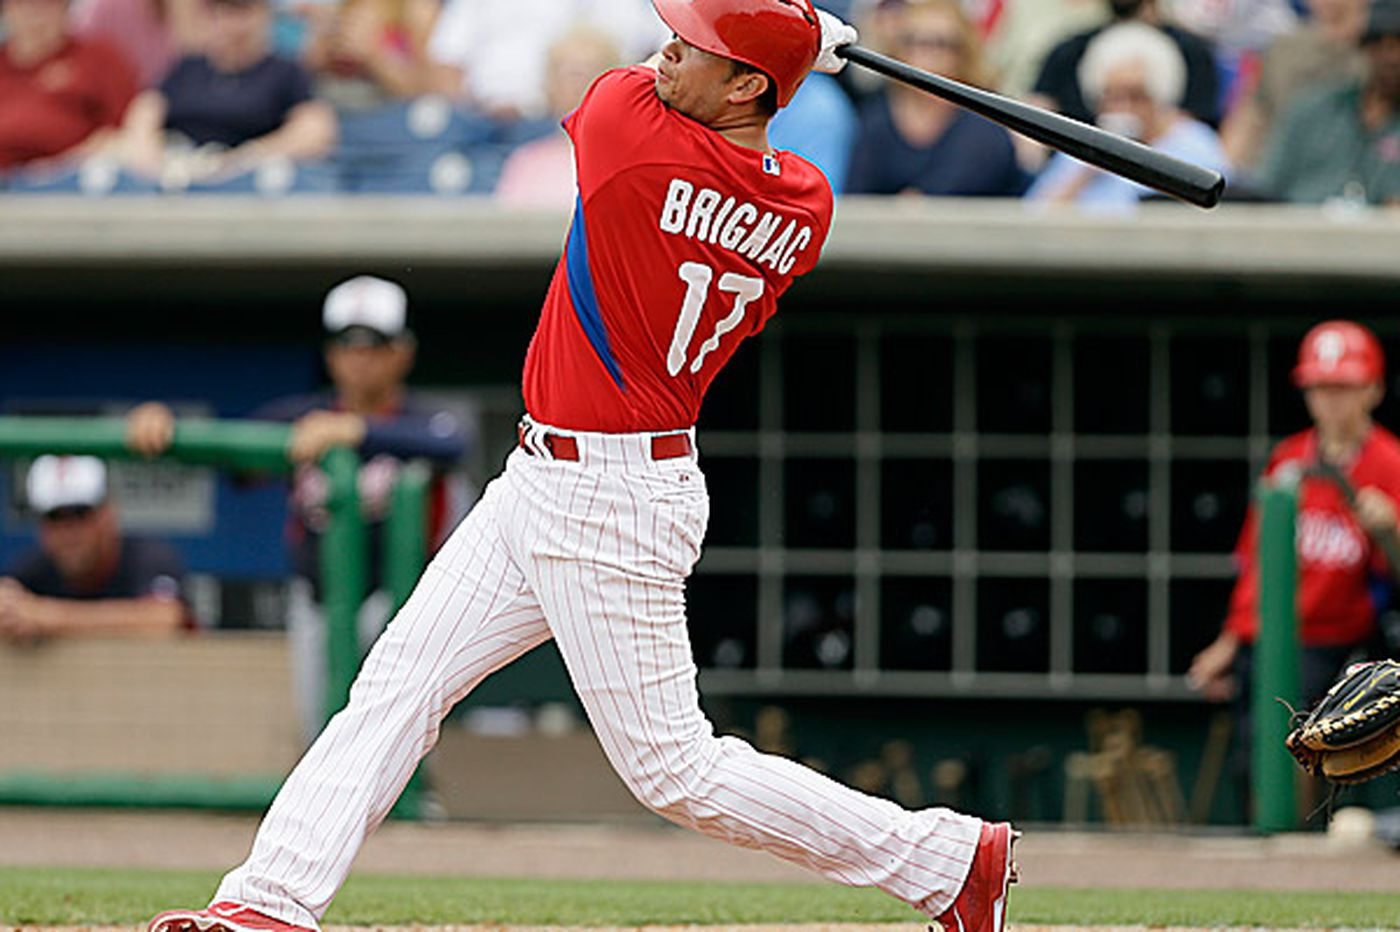 Phillies Minor League Report: Reid Brignac homer in 11th inning lifts IronPigs